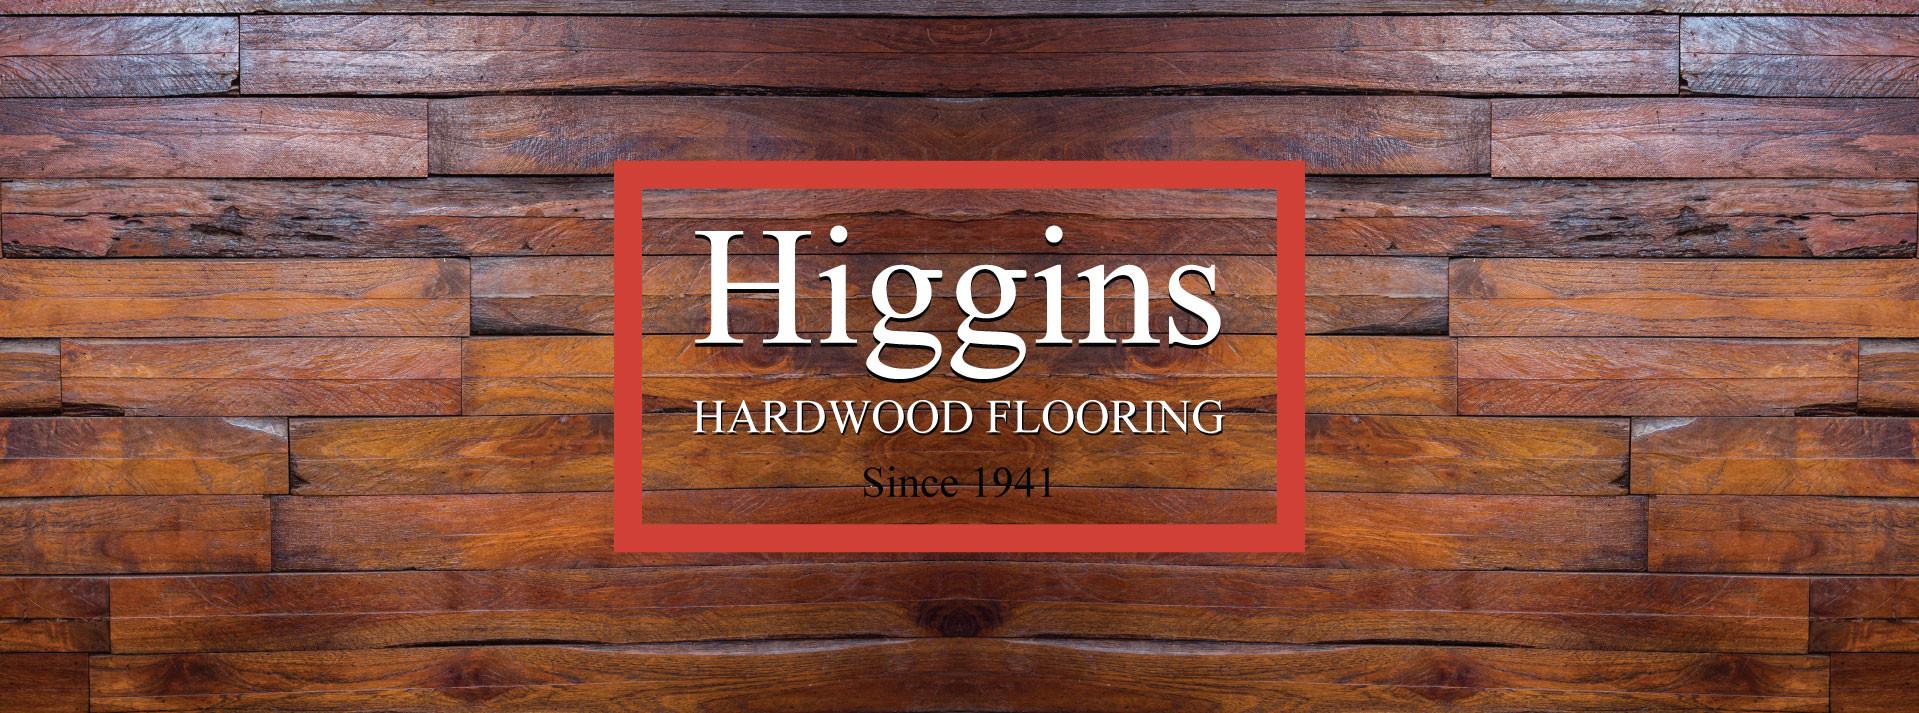 discount hardwood flooring toronto of higgins hardwood flooring in peterborough oshawa lindsay ajax in office hours